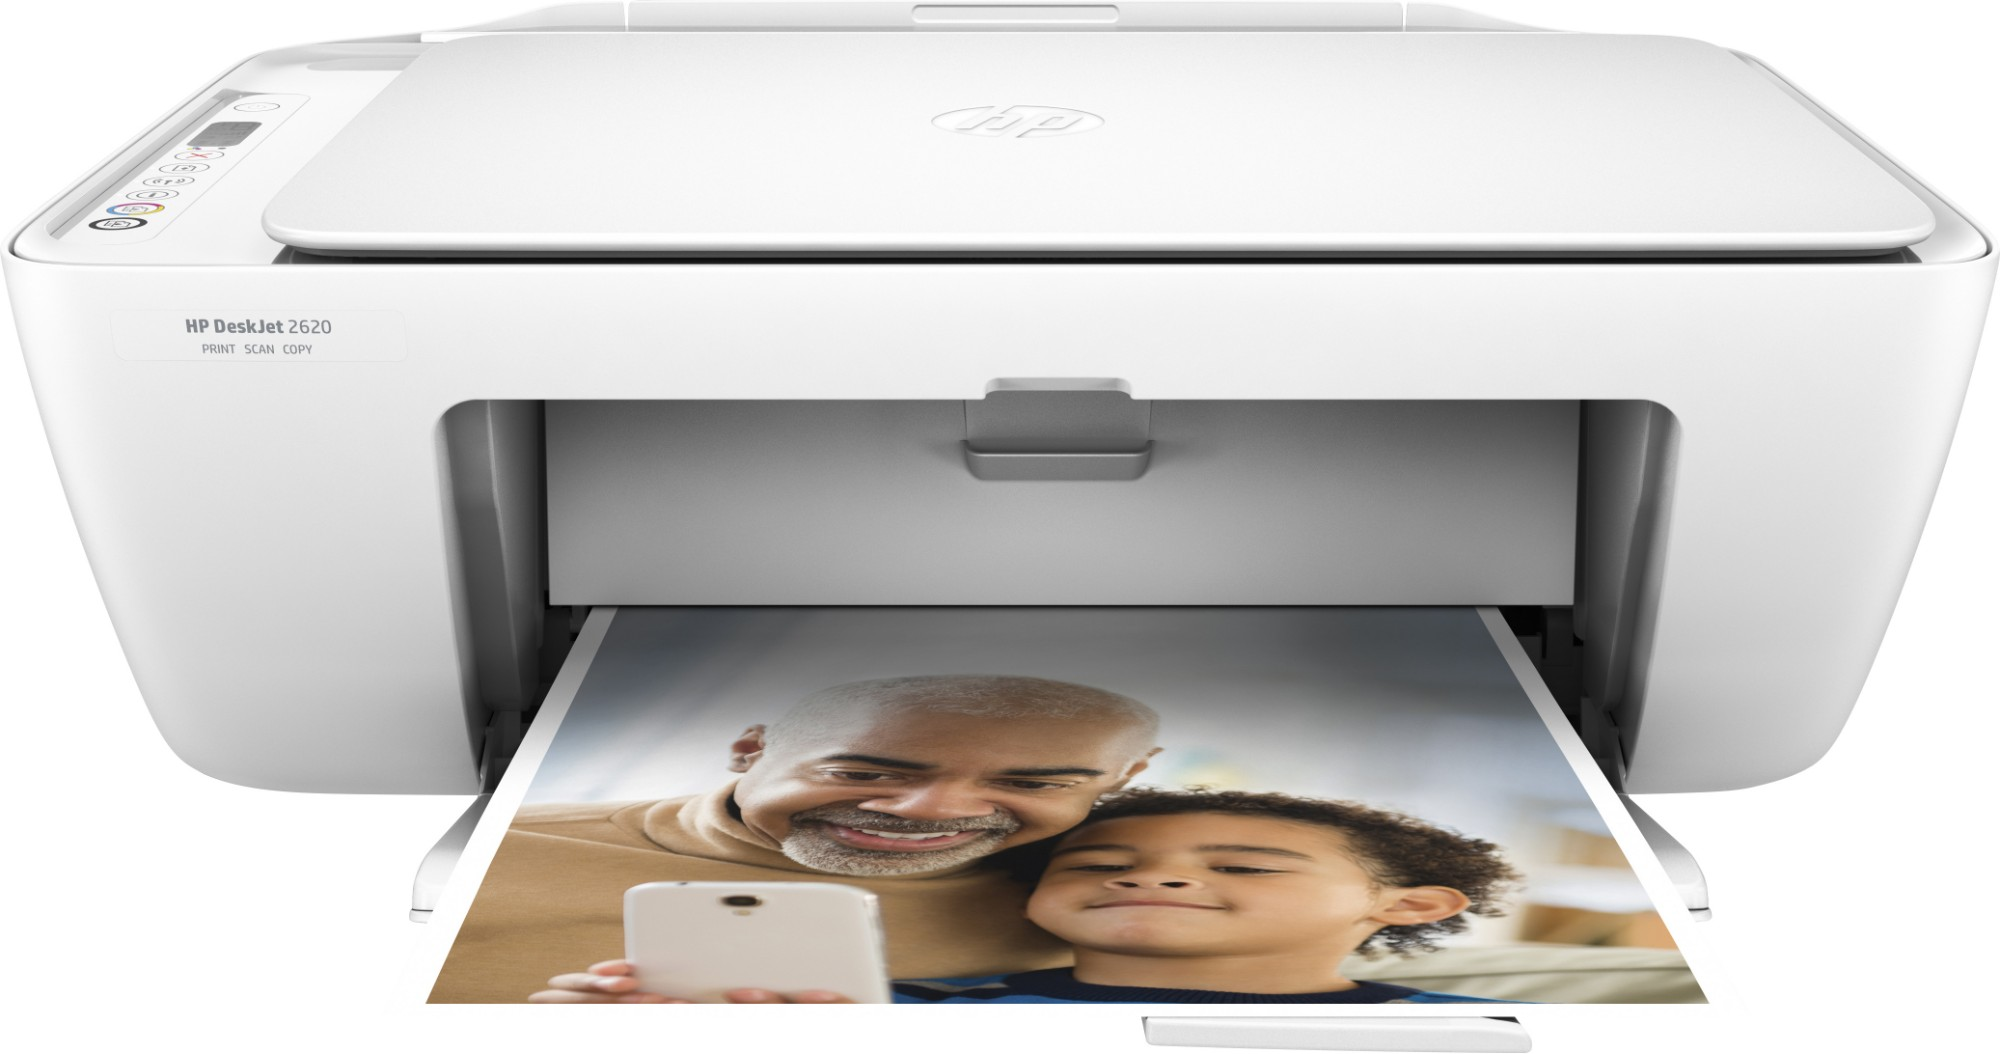 HP DeskJet 2620 AiO 4800 x 1200DPI Thermal Inkjet A4 7.5ppm Wi-Fi